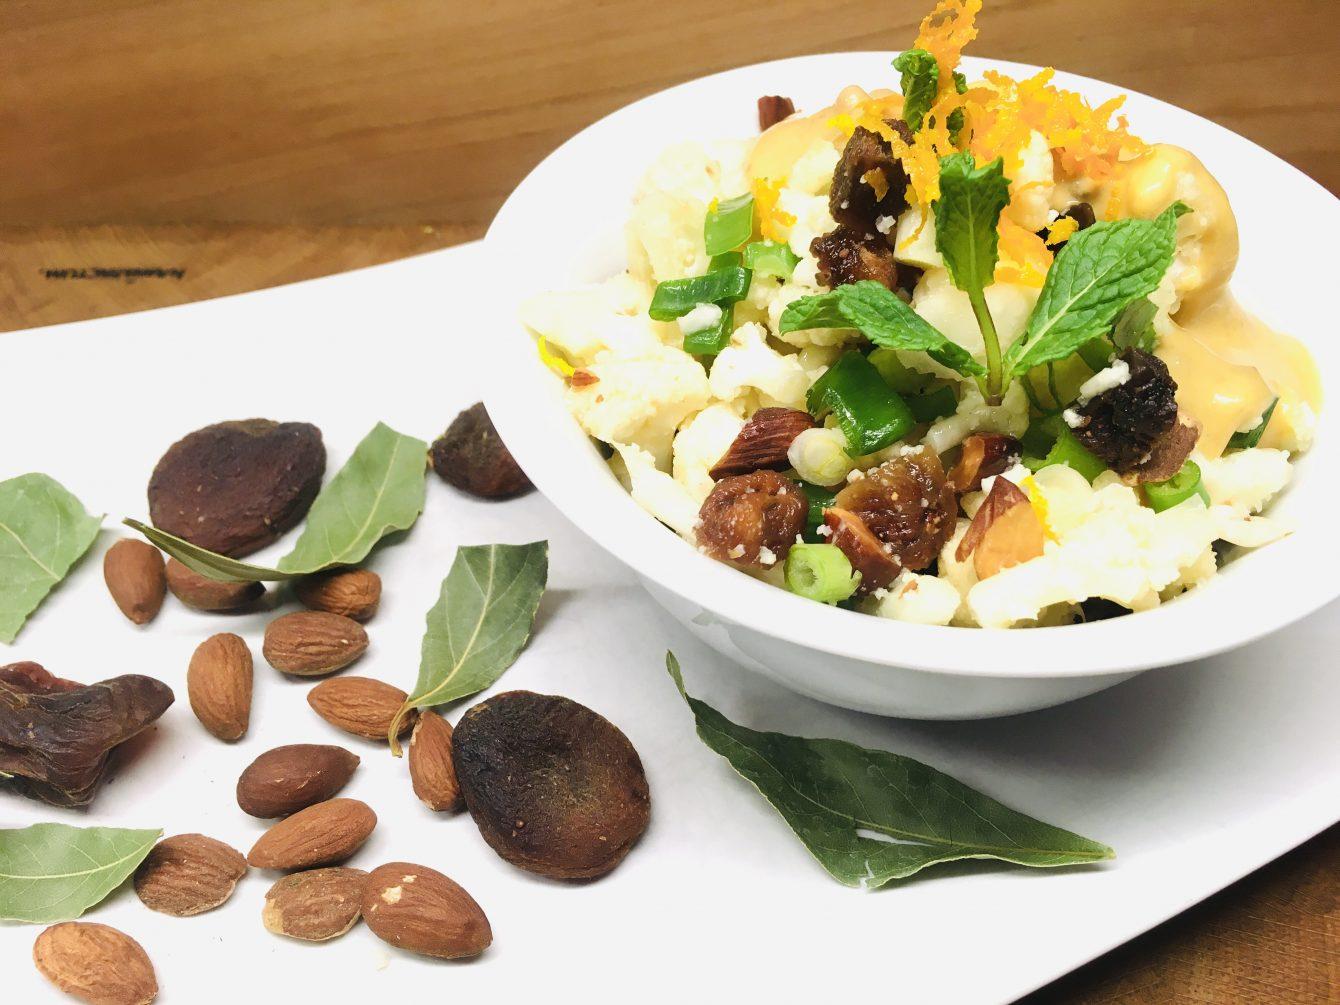 Rohkost Blumenkohl Salat mit Aprikosen Mandel Dressing